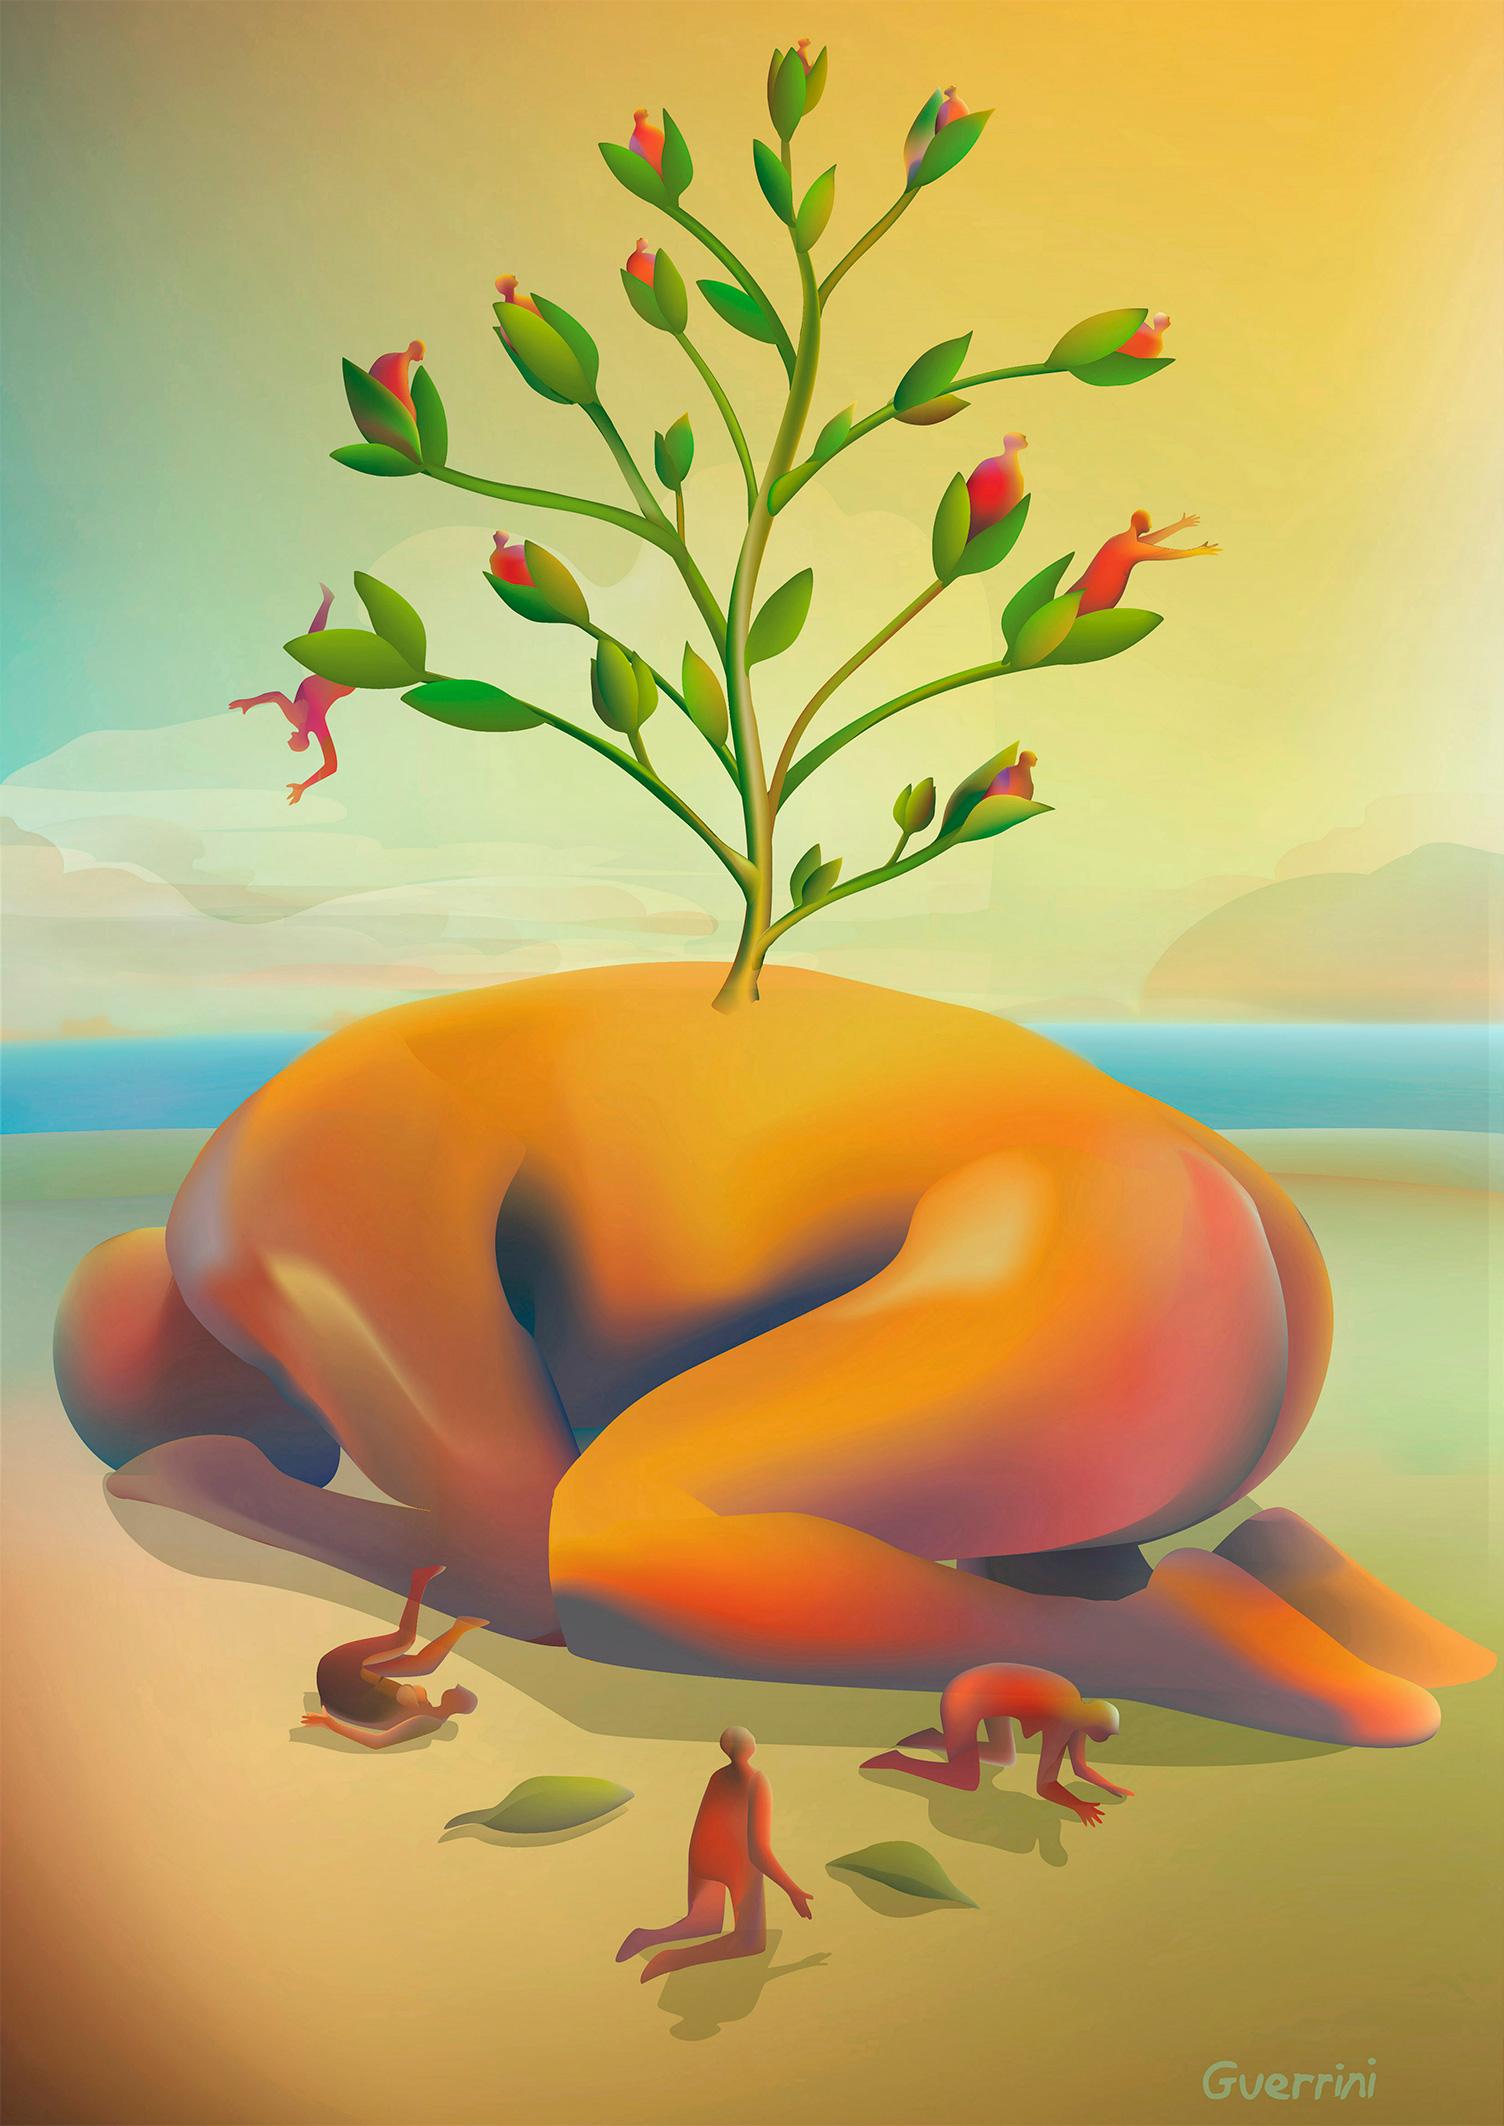 Creativity blossom